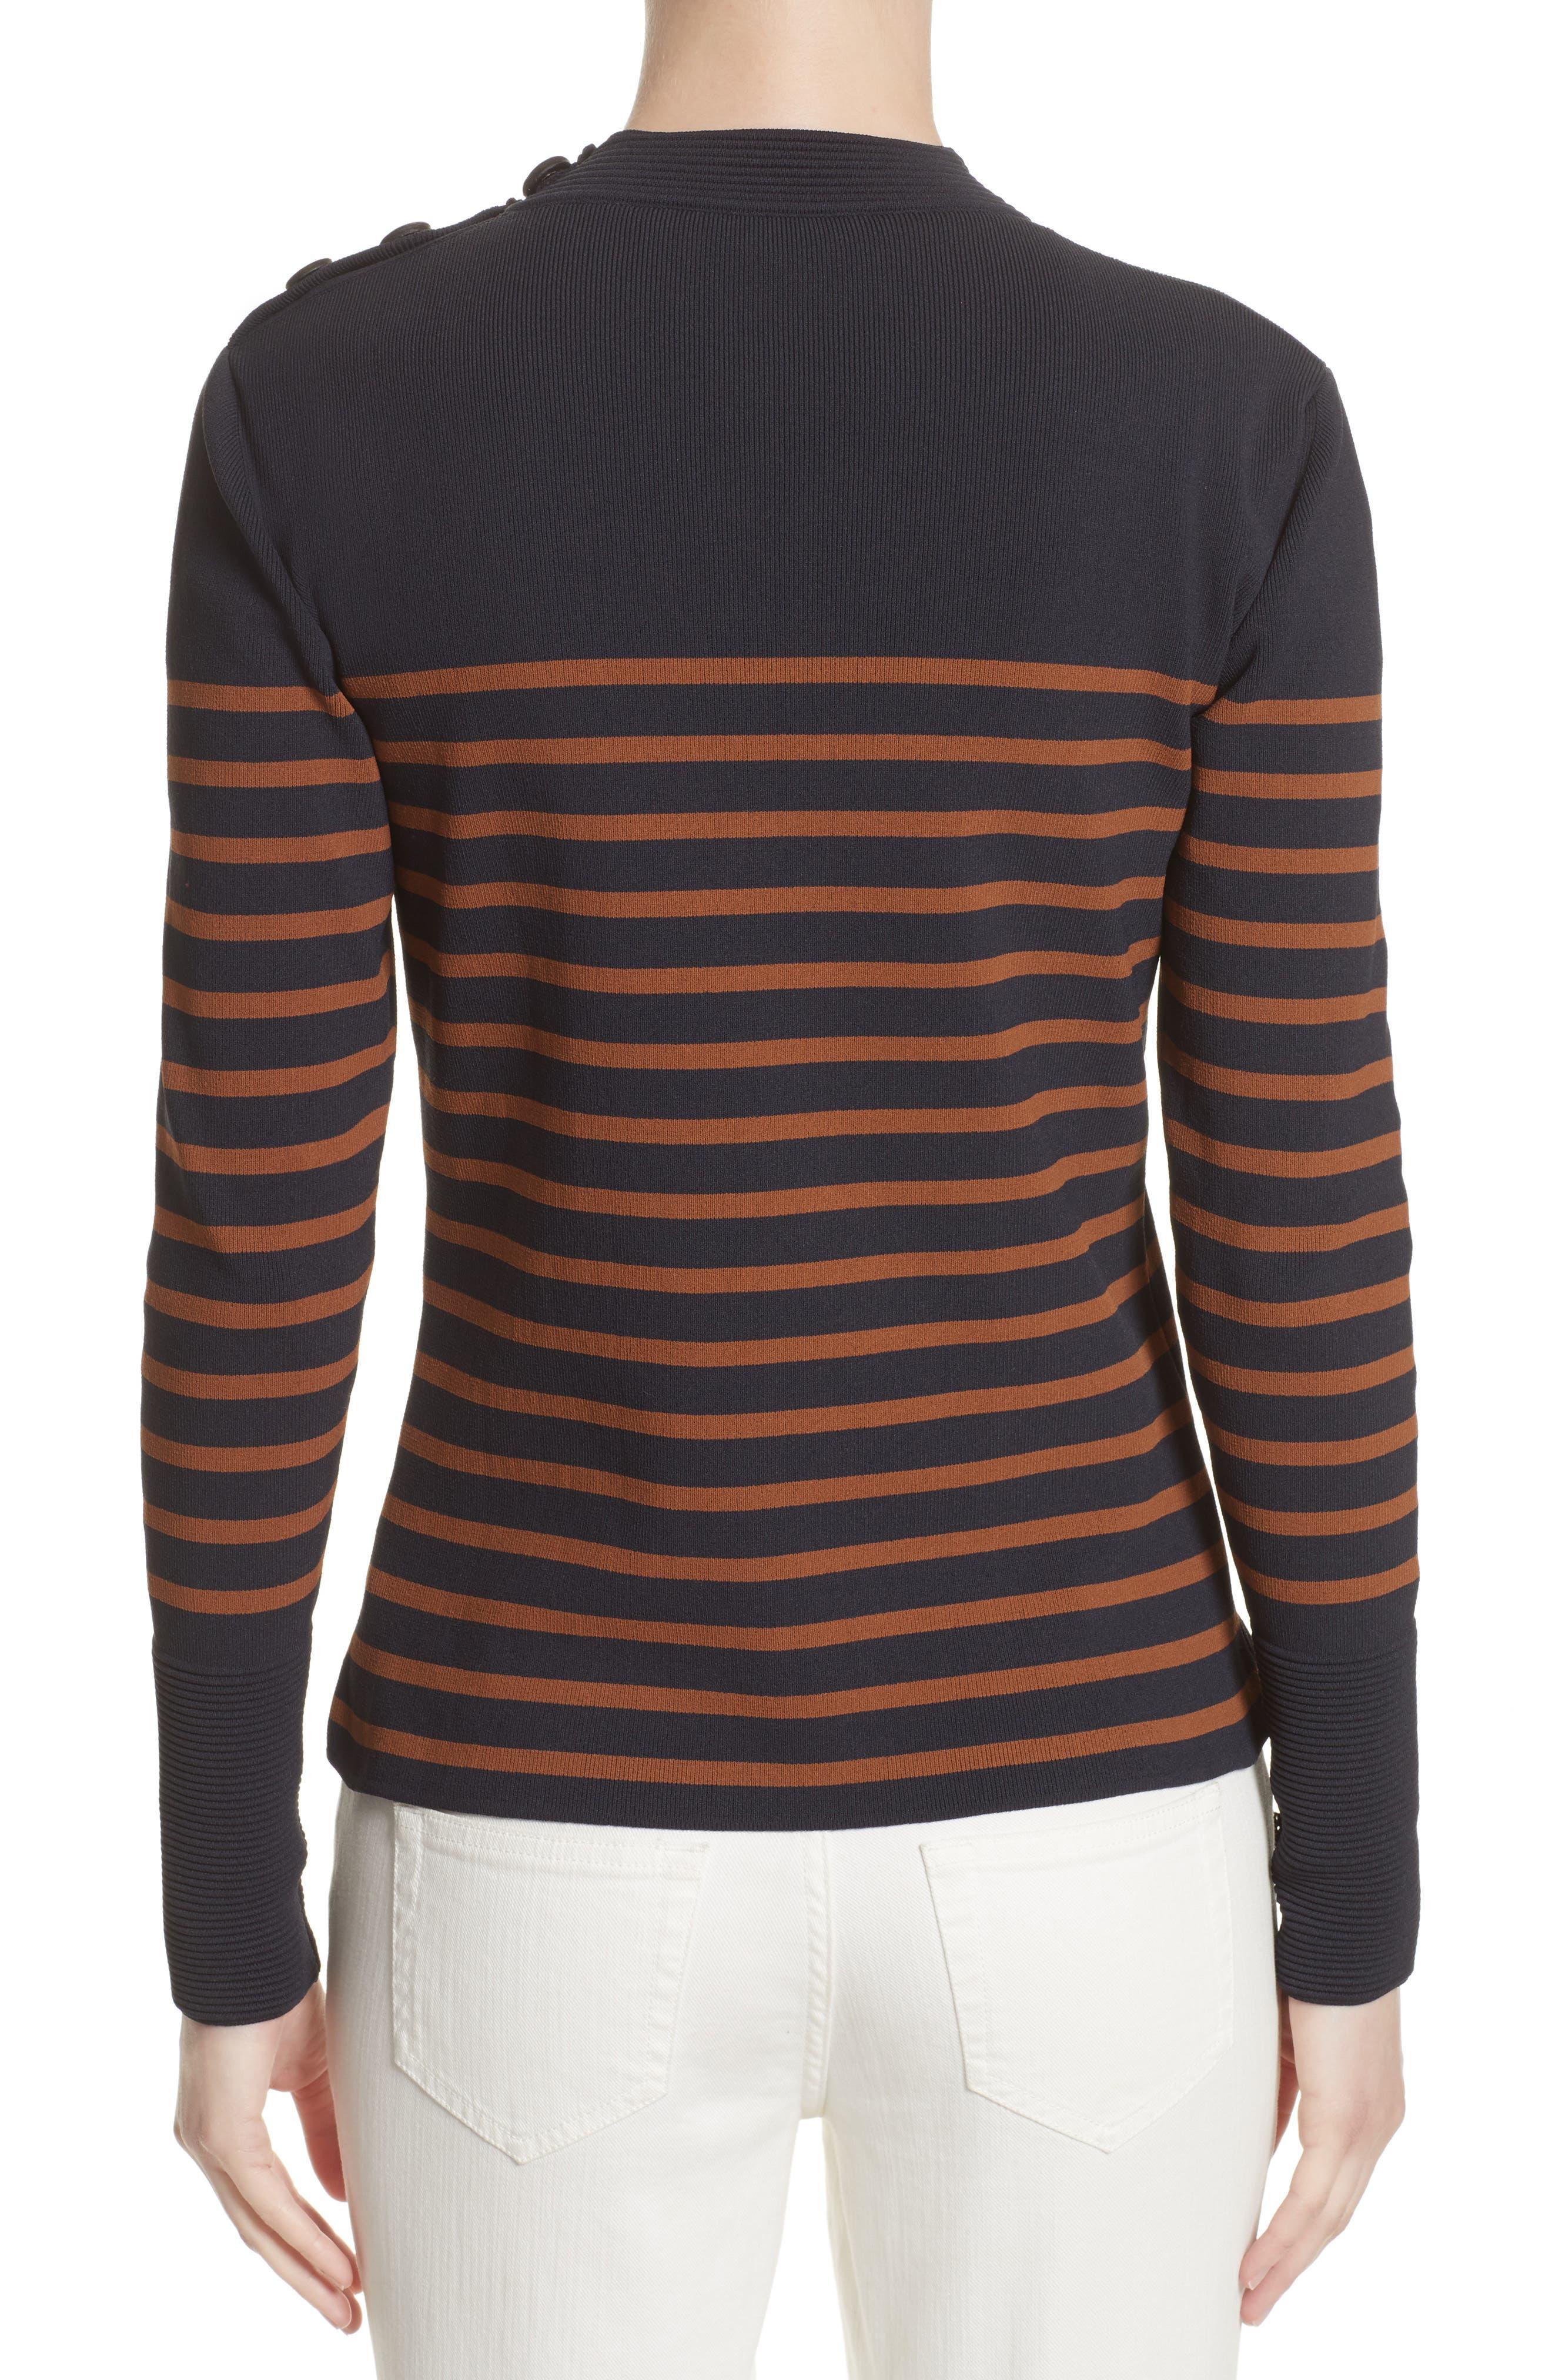 Selicia Stripe Sweater,                             Alternate thumbnail 2, color,                             Black